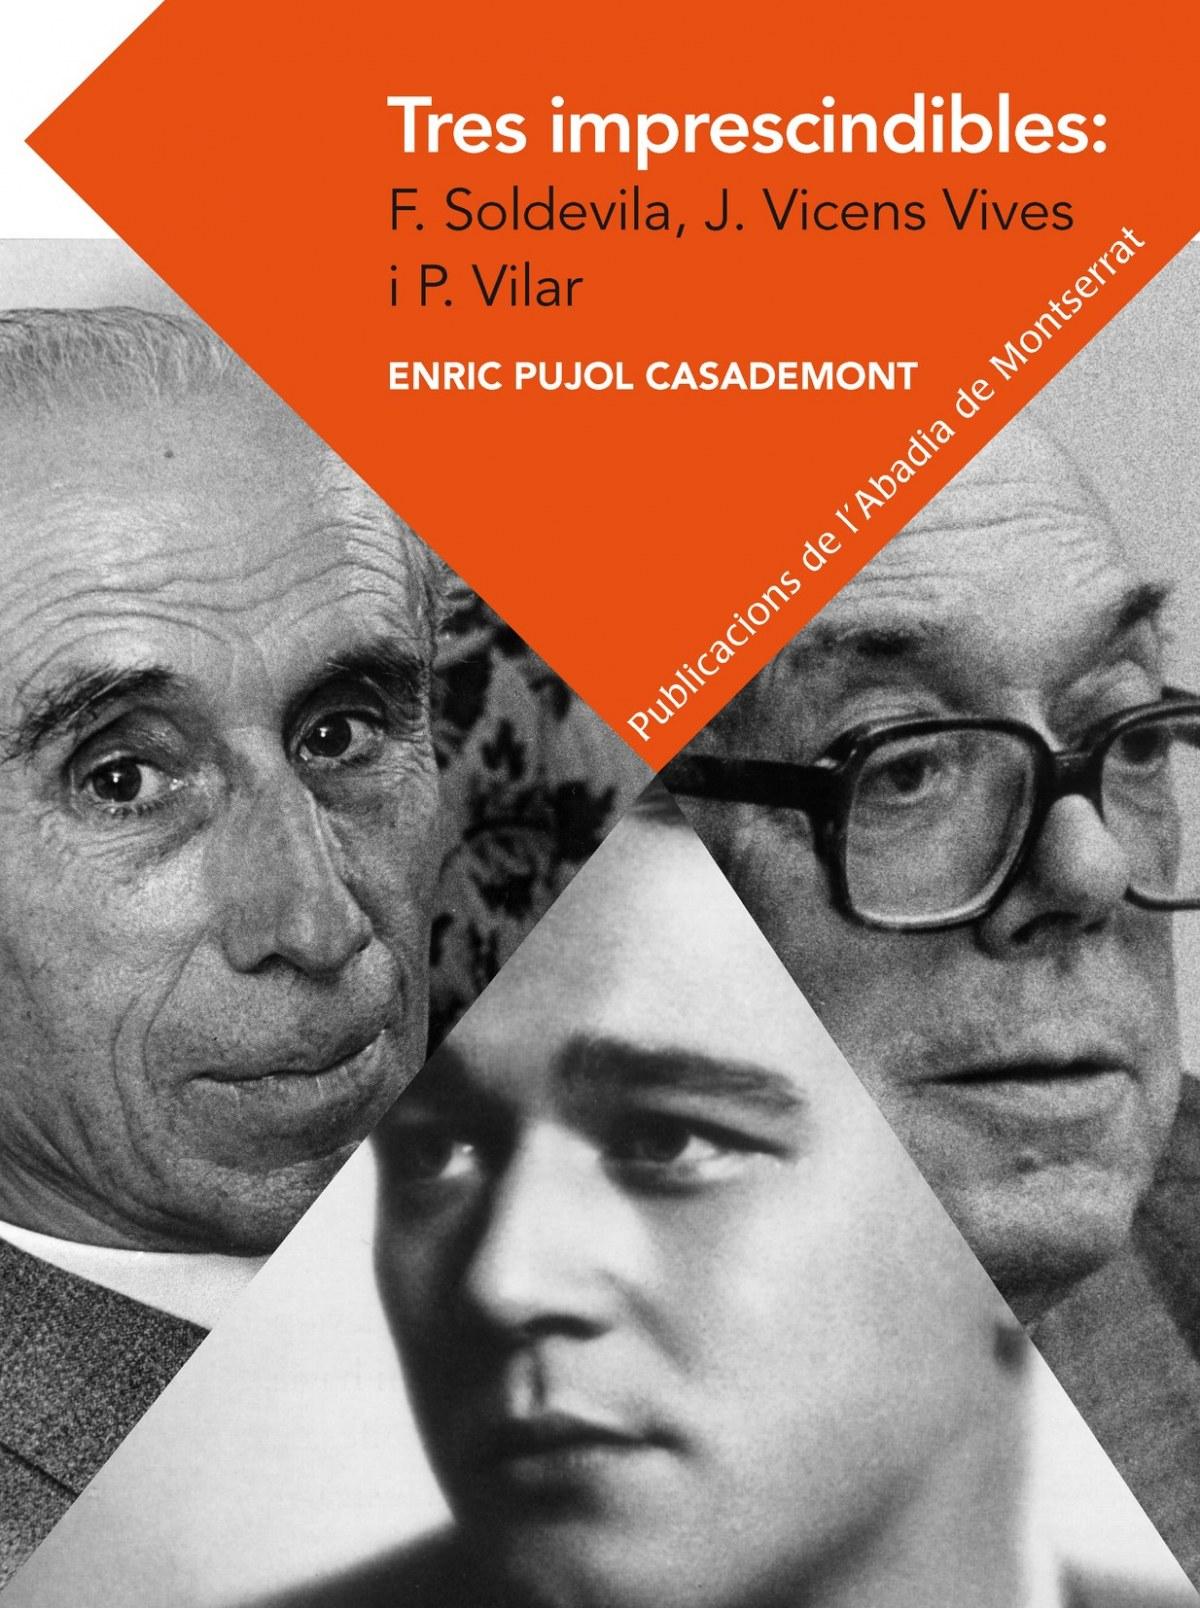 Tres imprescindibles: Sodevila, Vicens Vives i Vilar